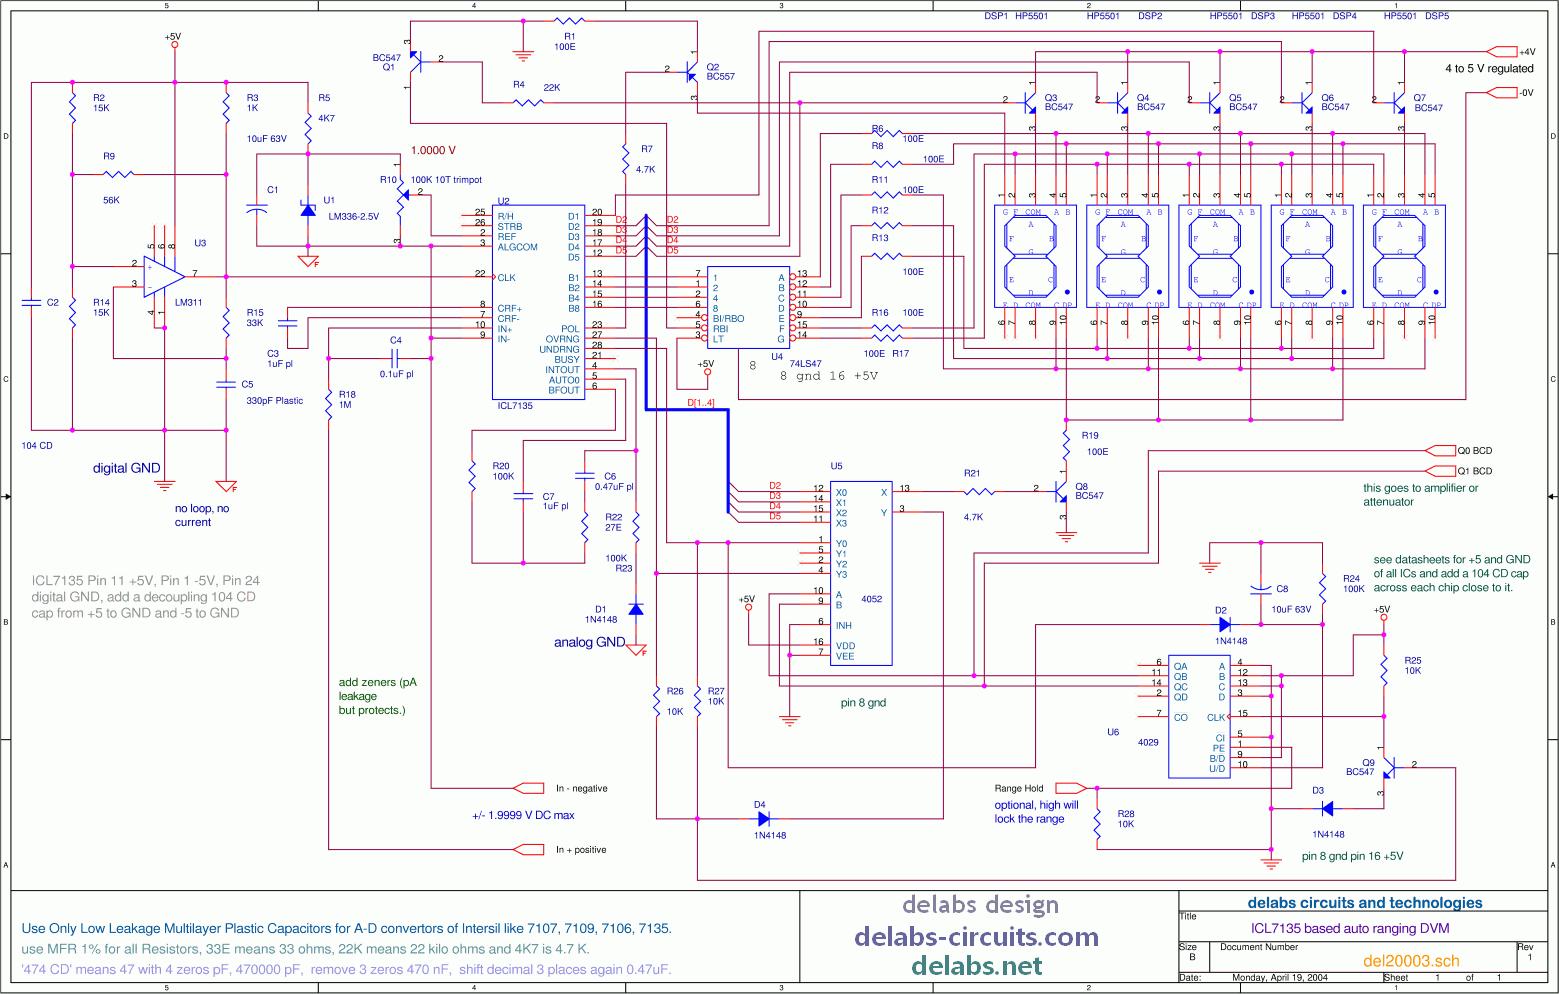 Analog Control Circuit Wiring Diagram Master Blogs Electronic Circuitscom Mixed Circuits Delabs Schematics Auto Ranging 4 1 2 Digit Digital Voltmeter Pid Motor